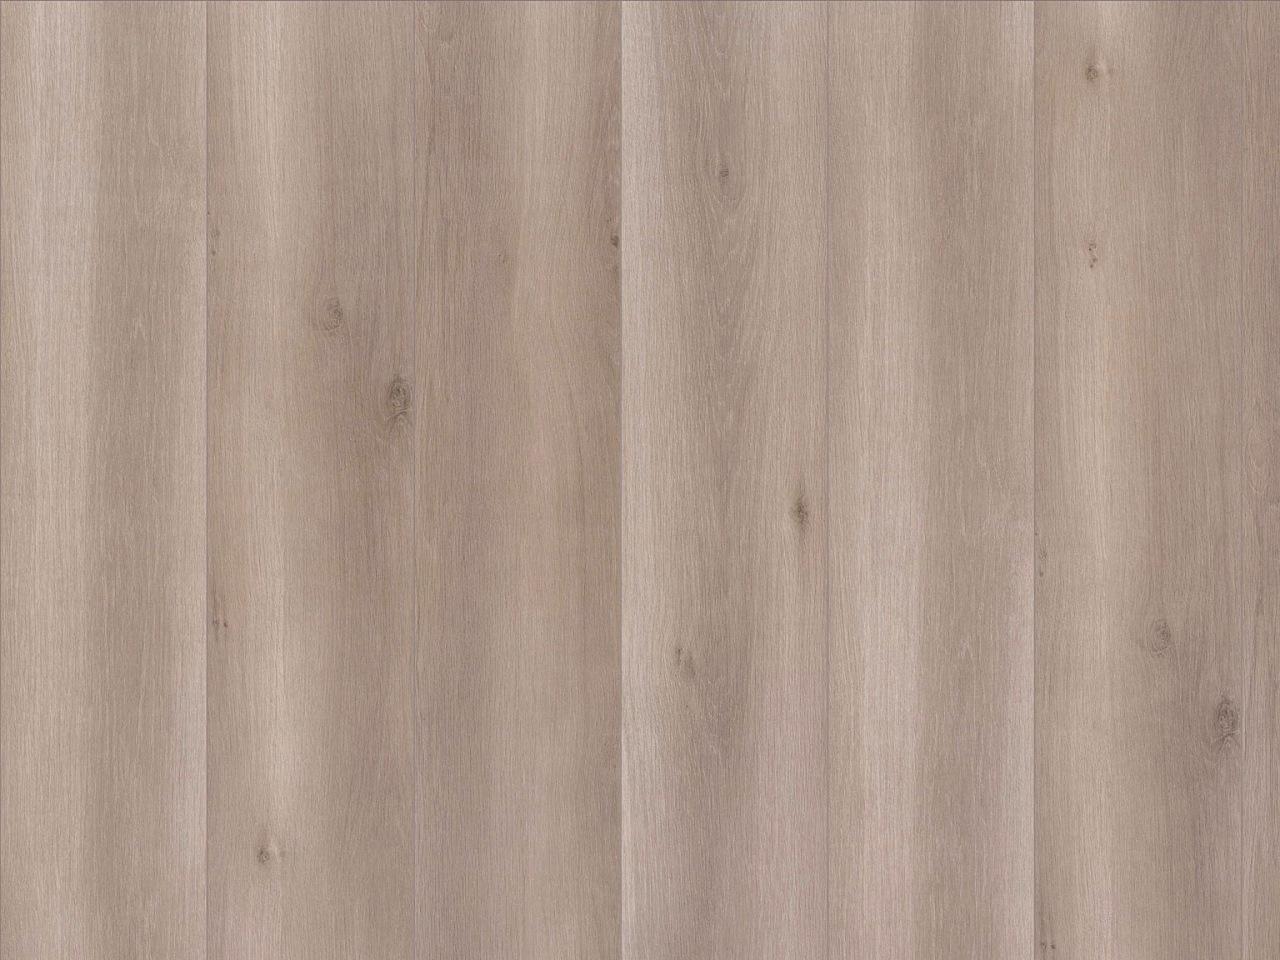 Laminatboden Oak Gallery Format L – Calm Oak grey, LV4168